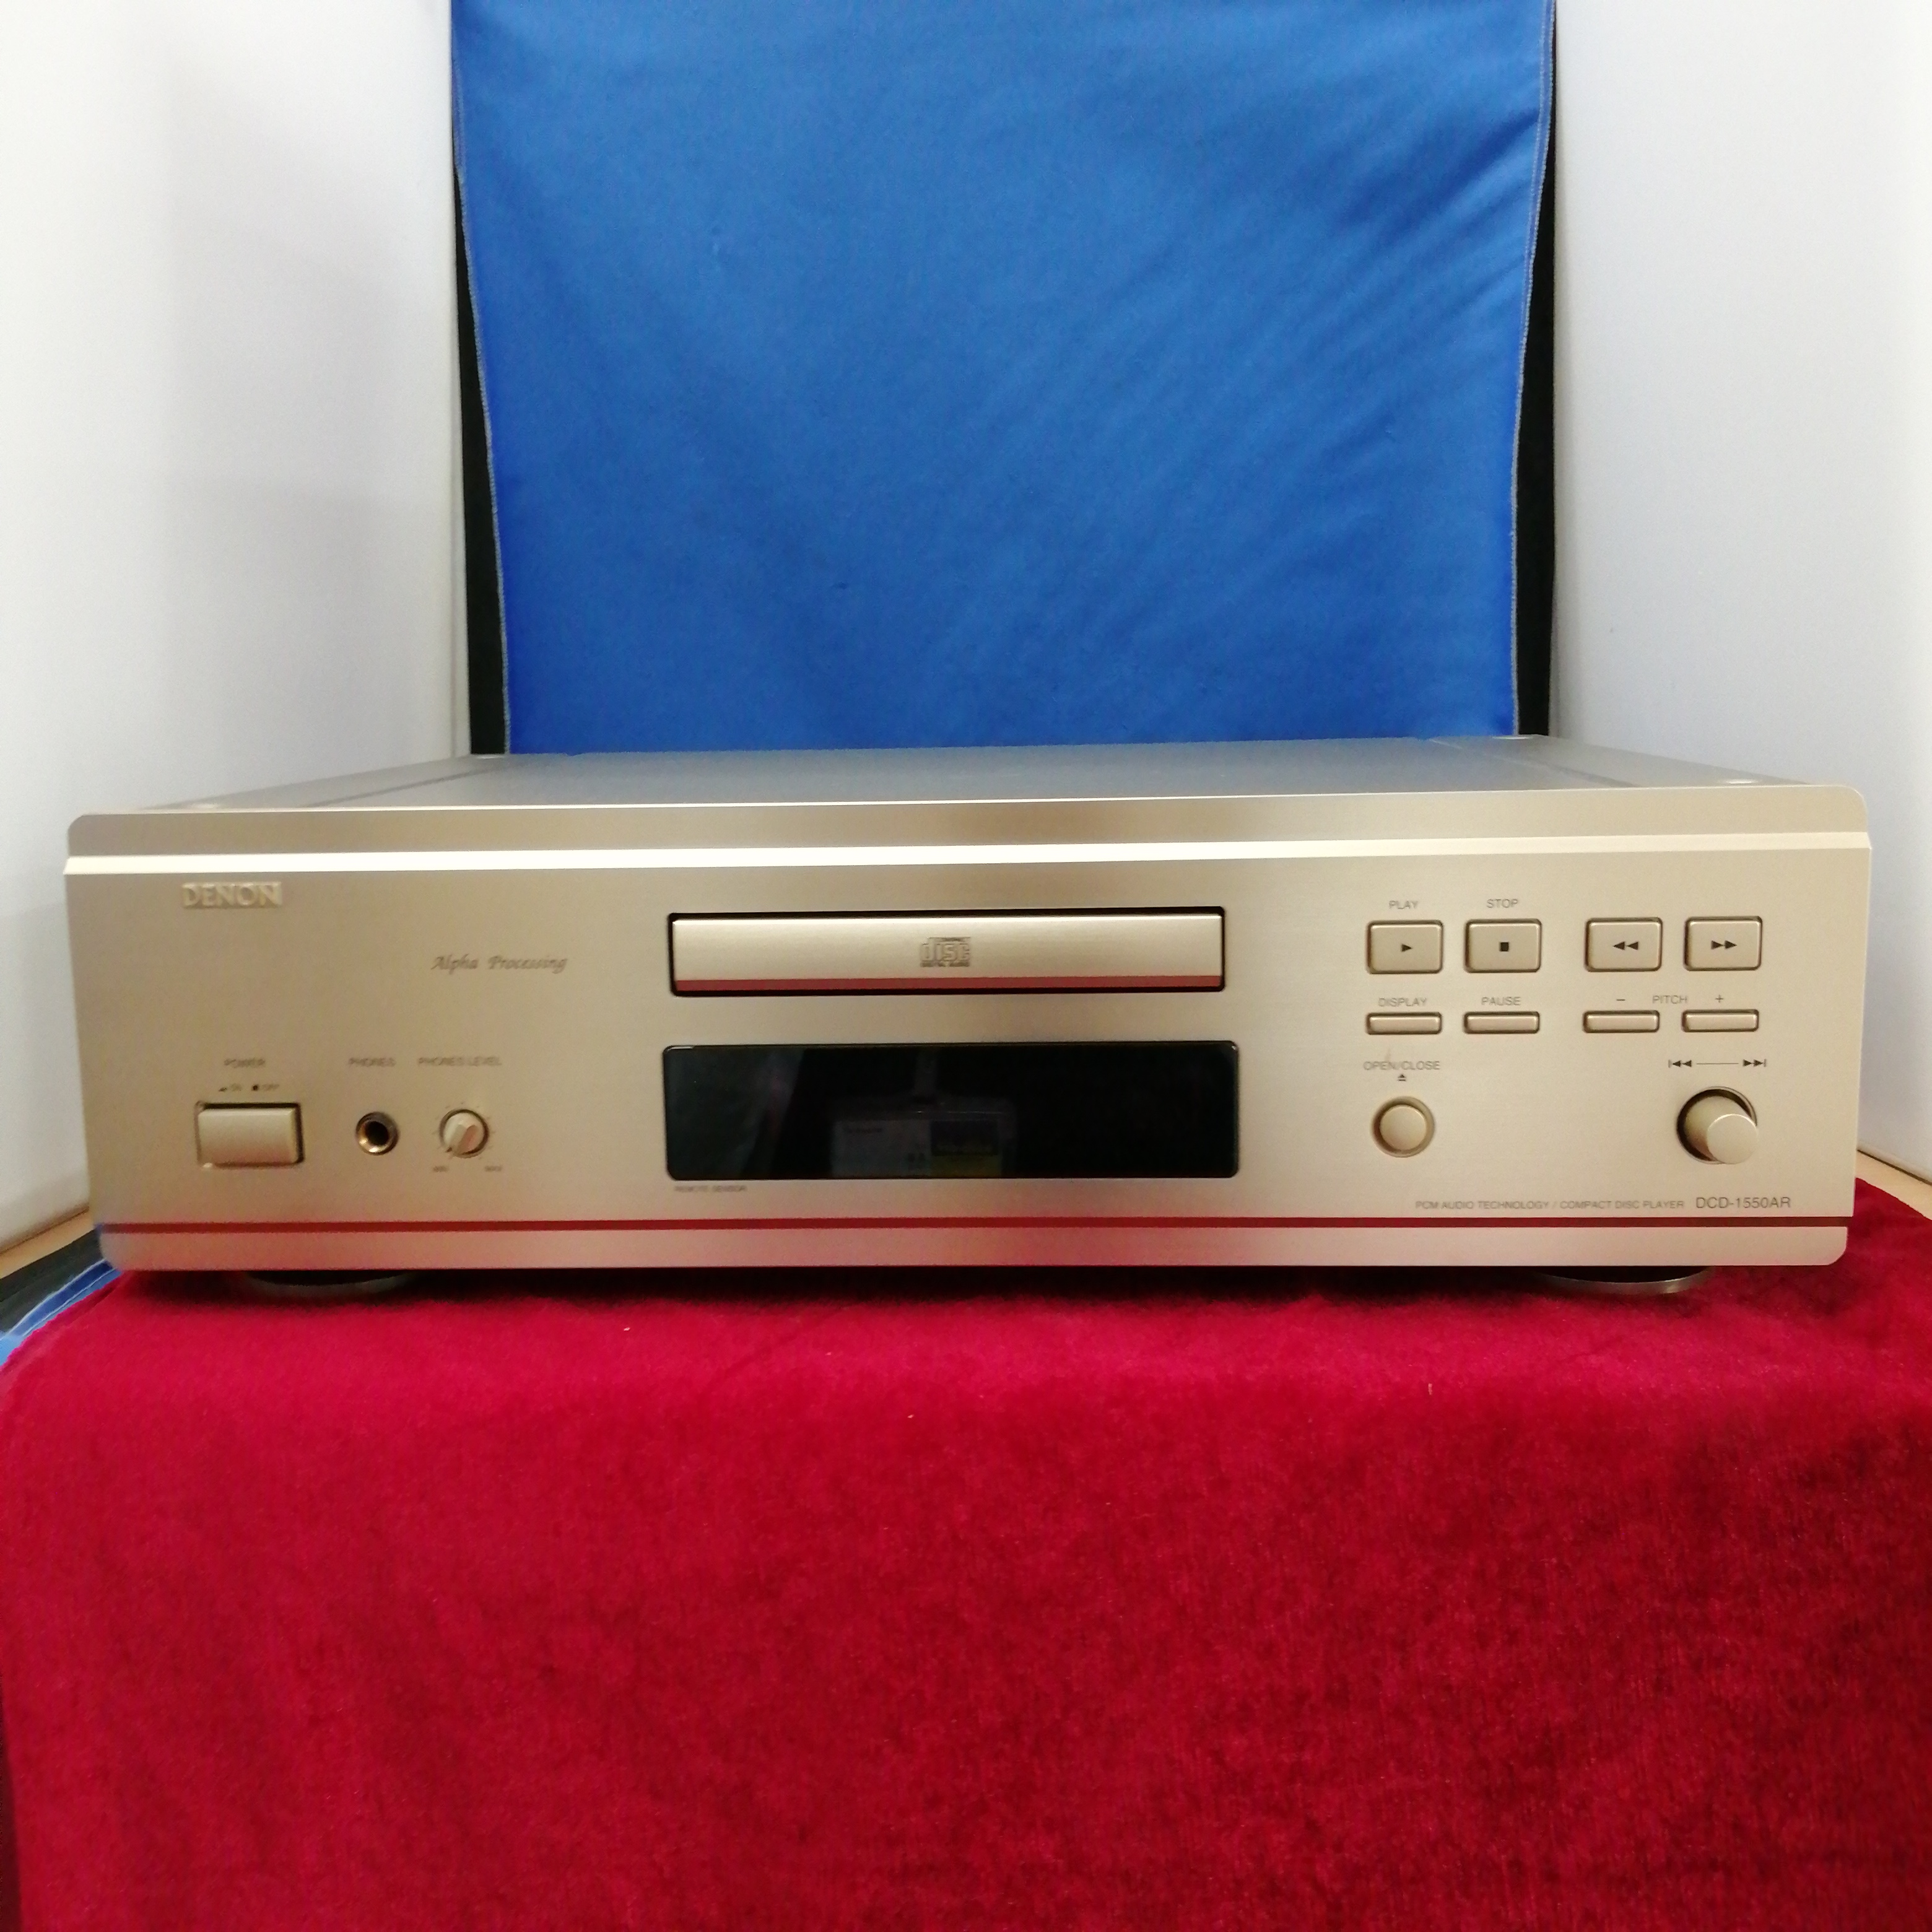 CDプレーヤー/DCD-1550AR DENON